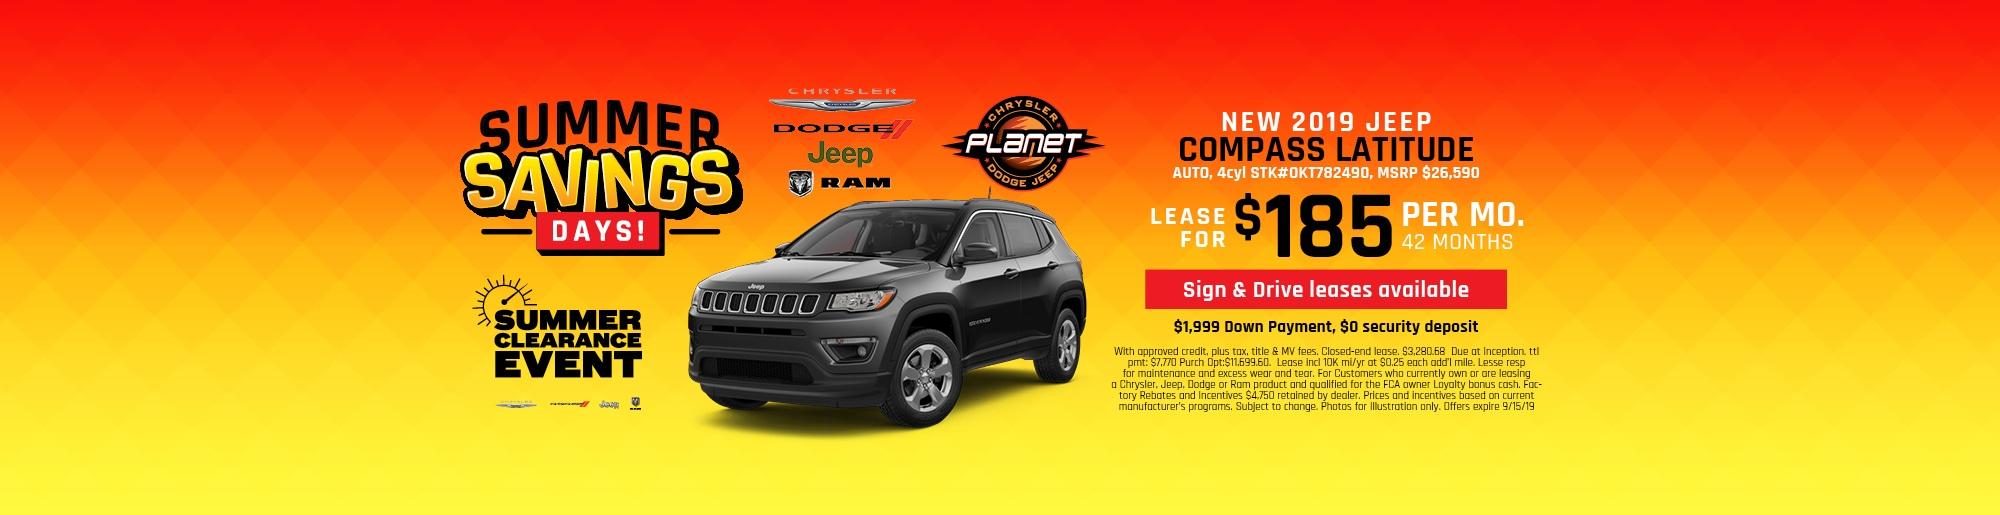 Planet Dodge, Chrysler, Jeep, RAM | New 2019 & Used Car Dealership